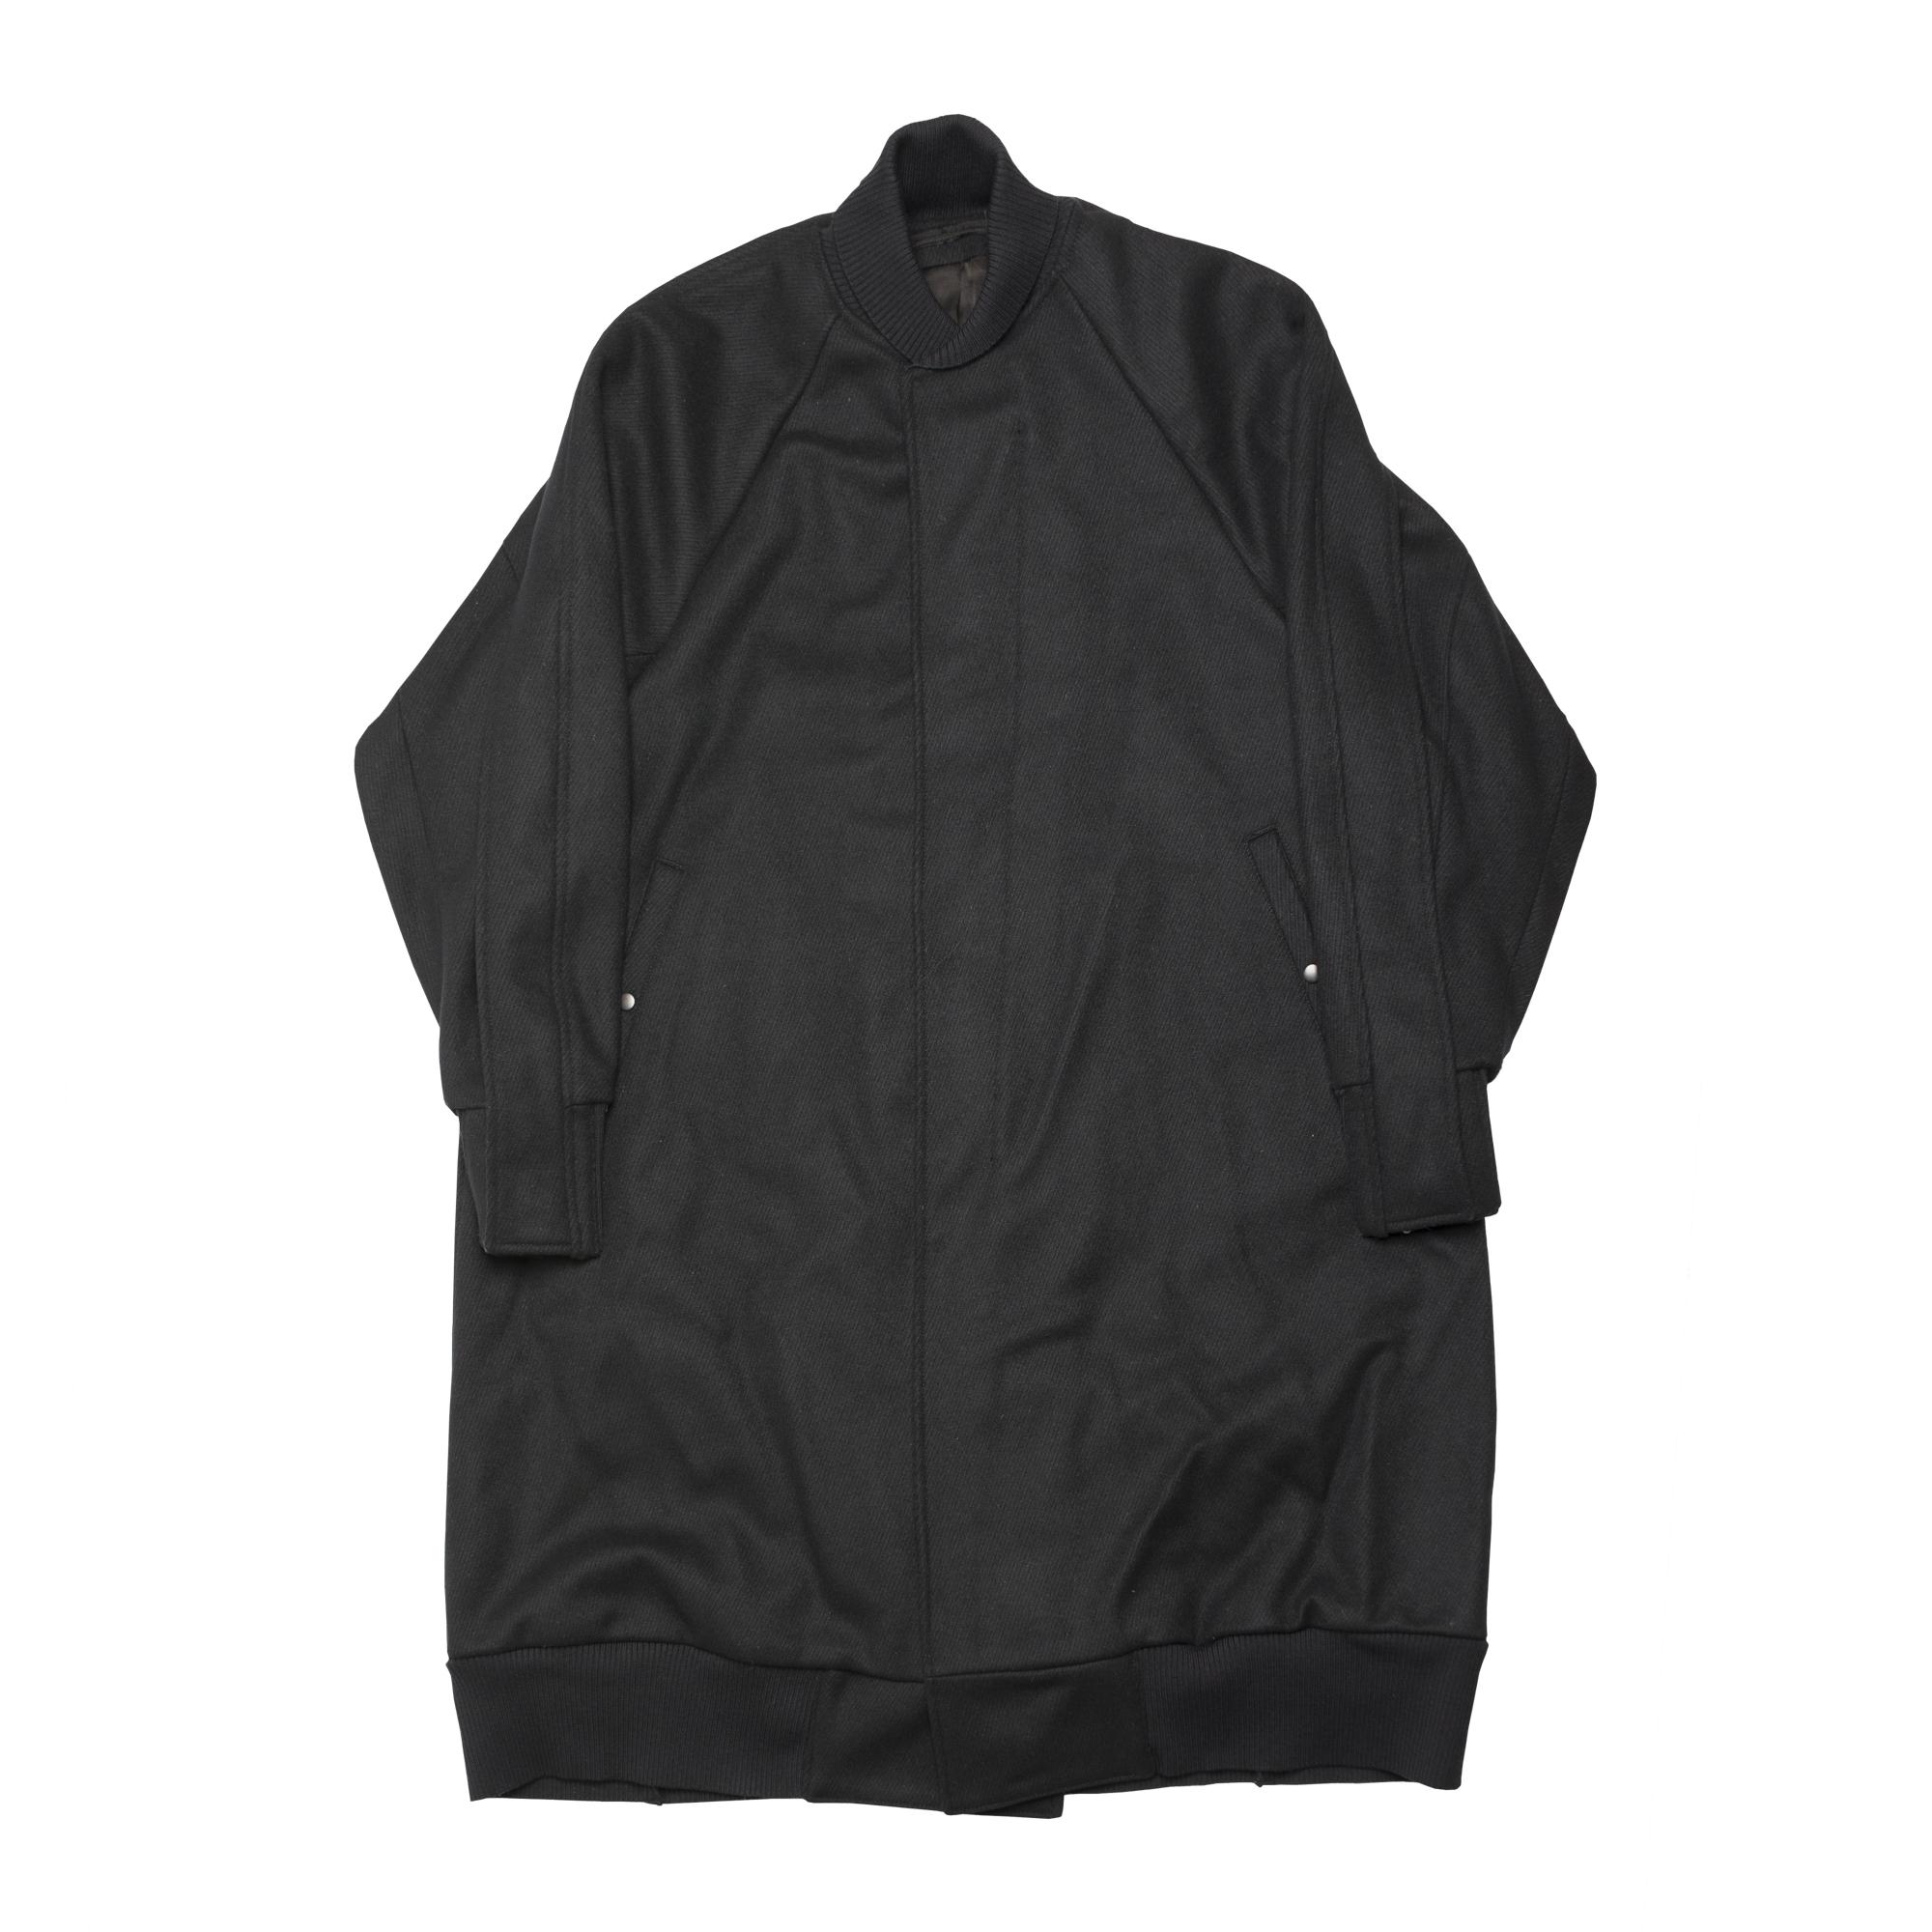 597COM2-BLACK / スラッシングロングスタジアムジャケット